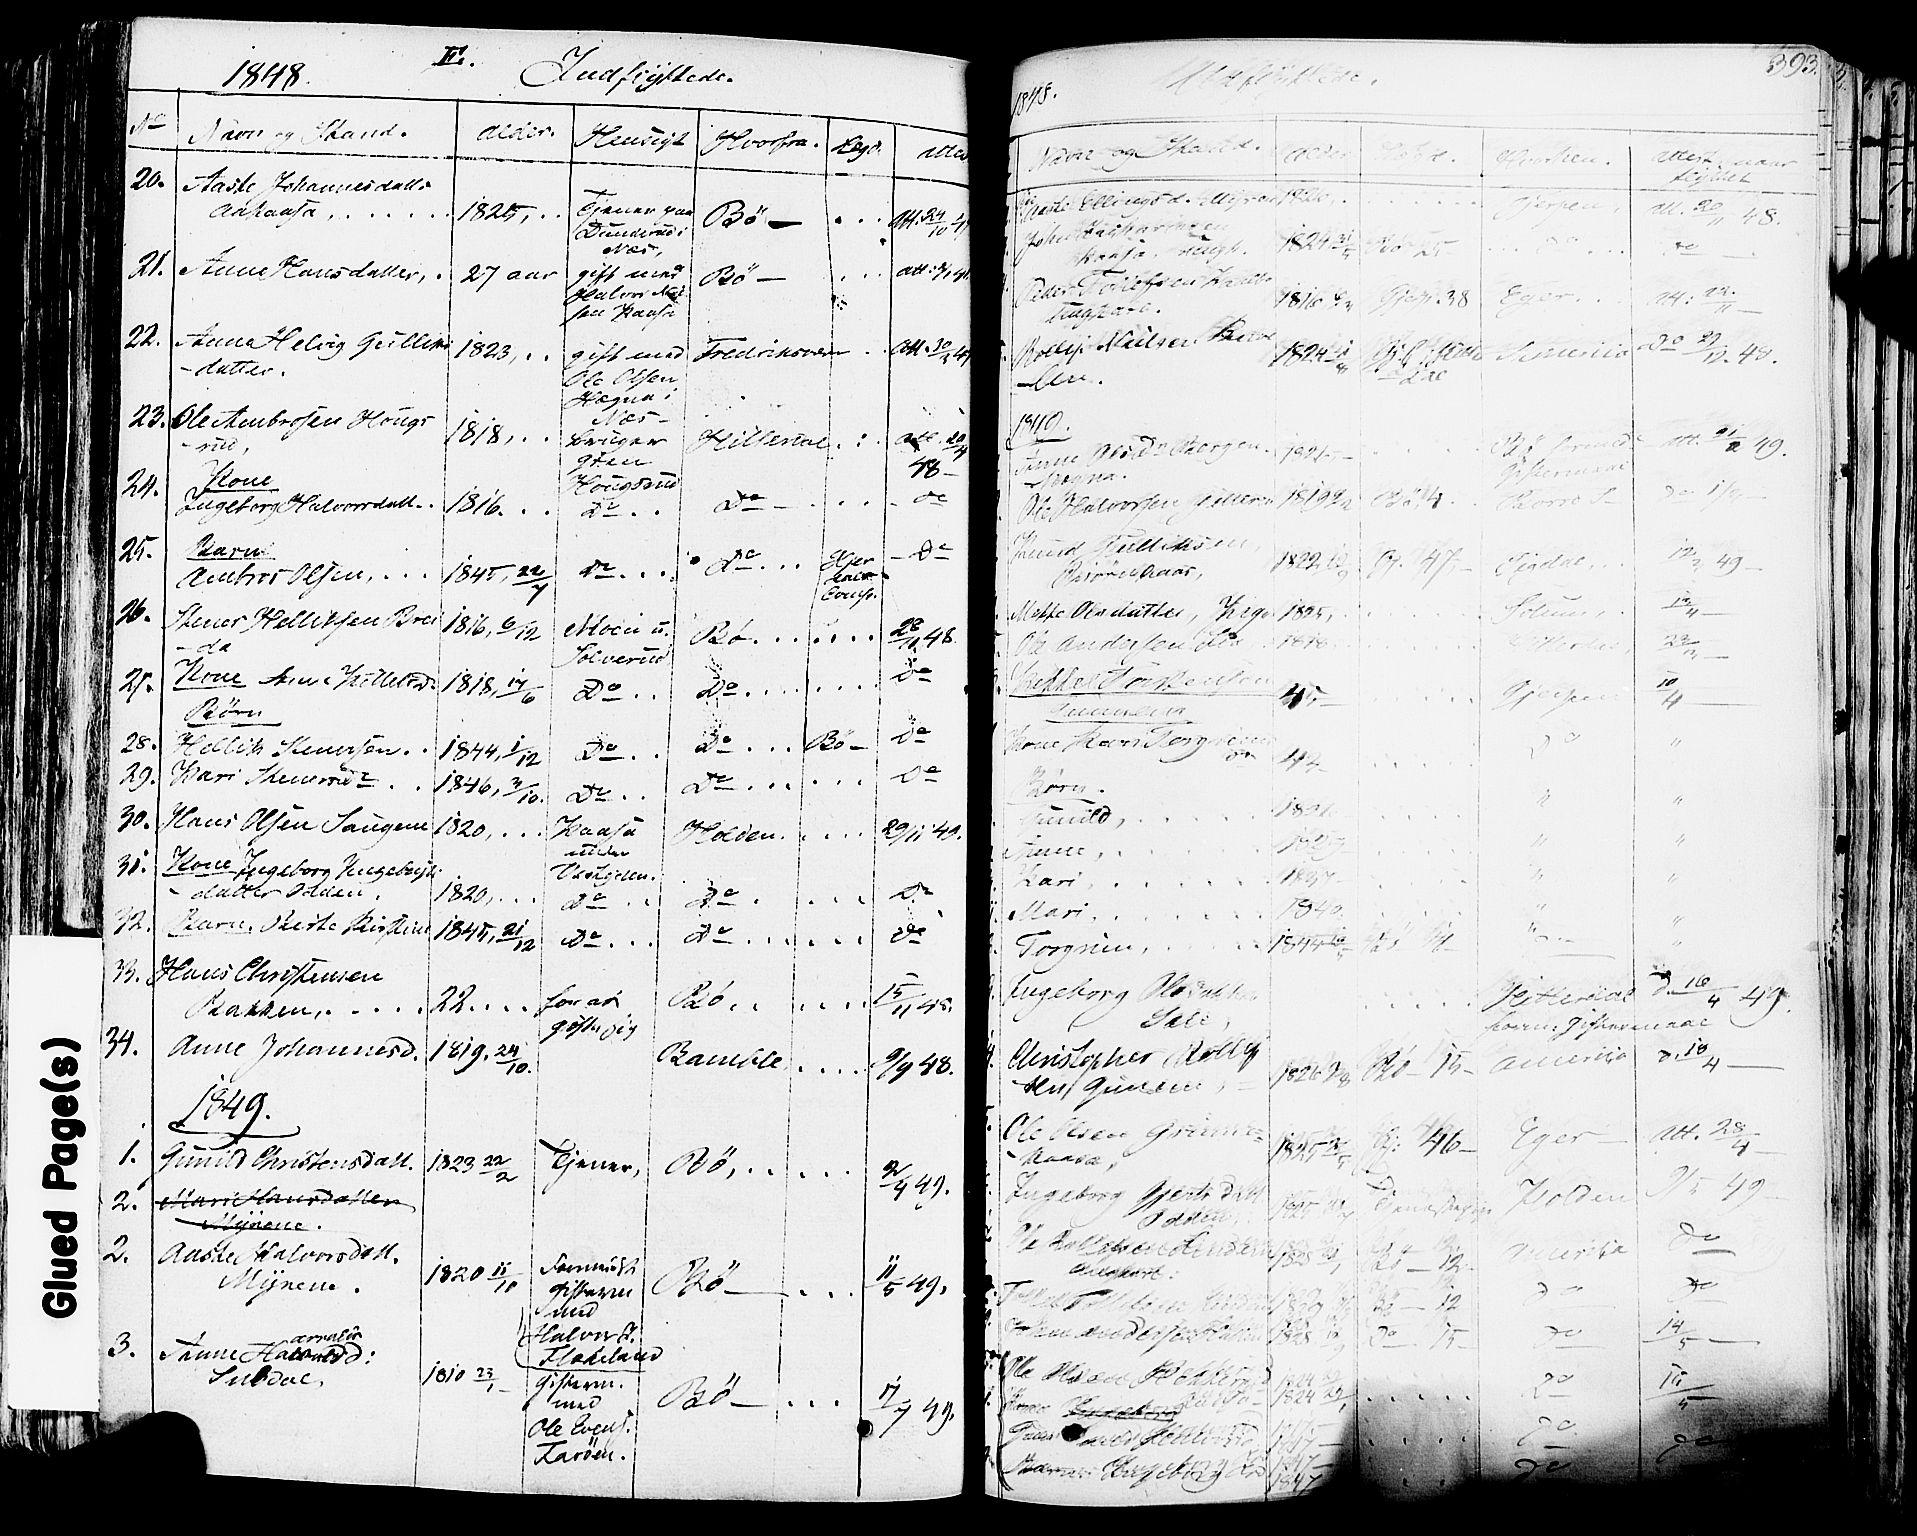 SAKO, Sauherad kirkebøker, F/Fa/L0006: Ministerialbok nr. I 6, 1827-1850, s. 393